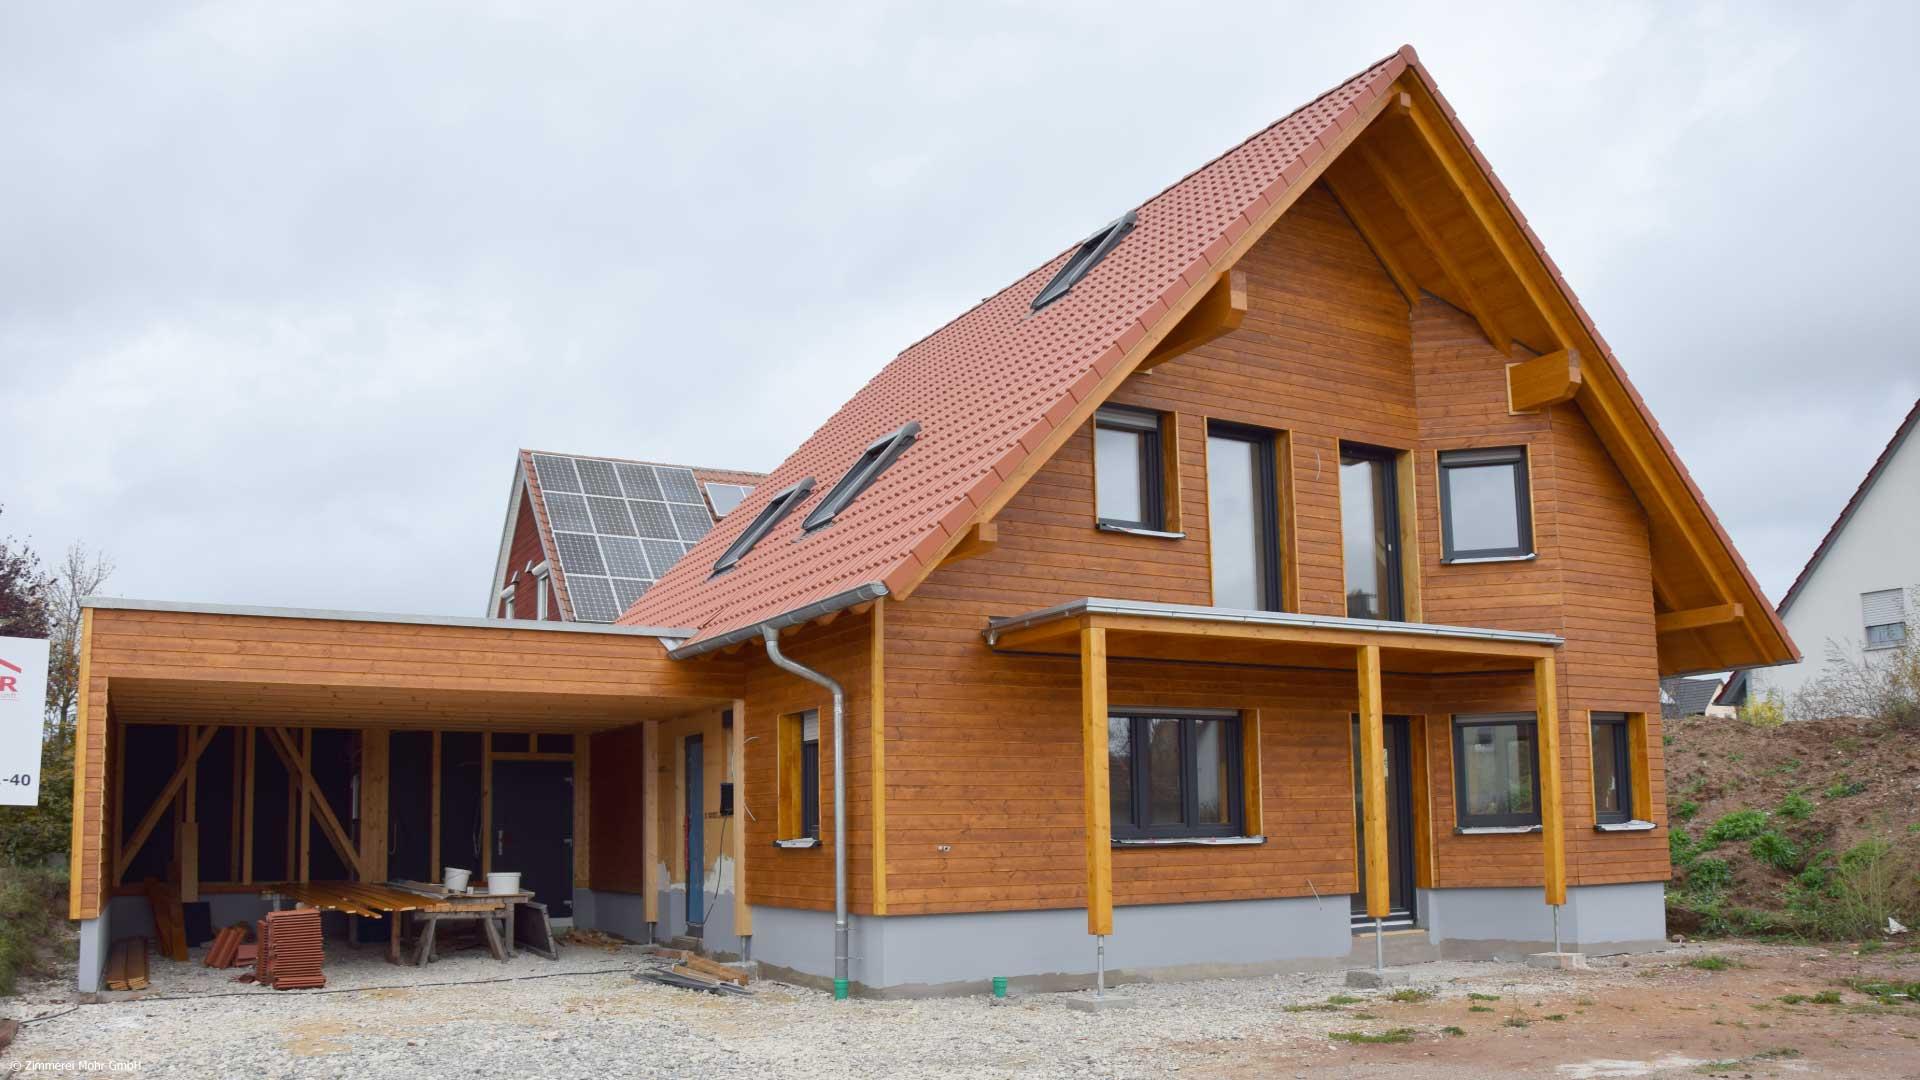 Familienhaus KAISER - Neubau Holzhaus mit lasierter Holzfassade